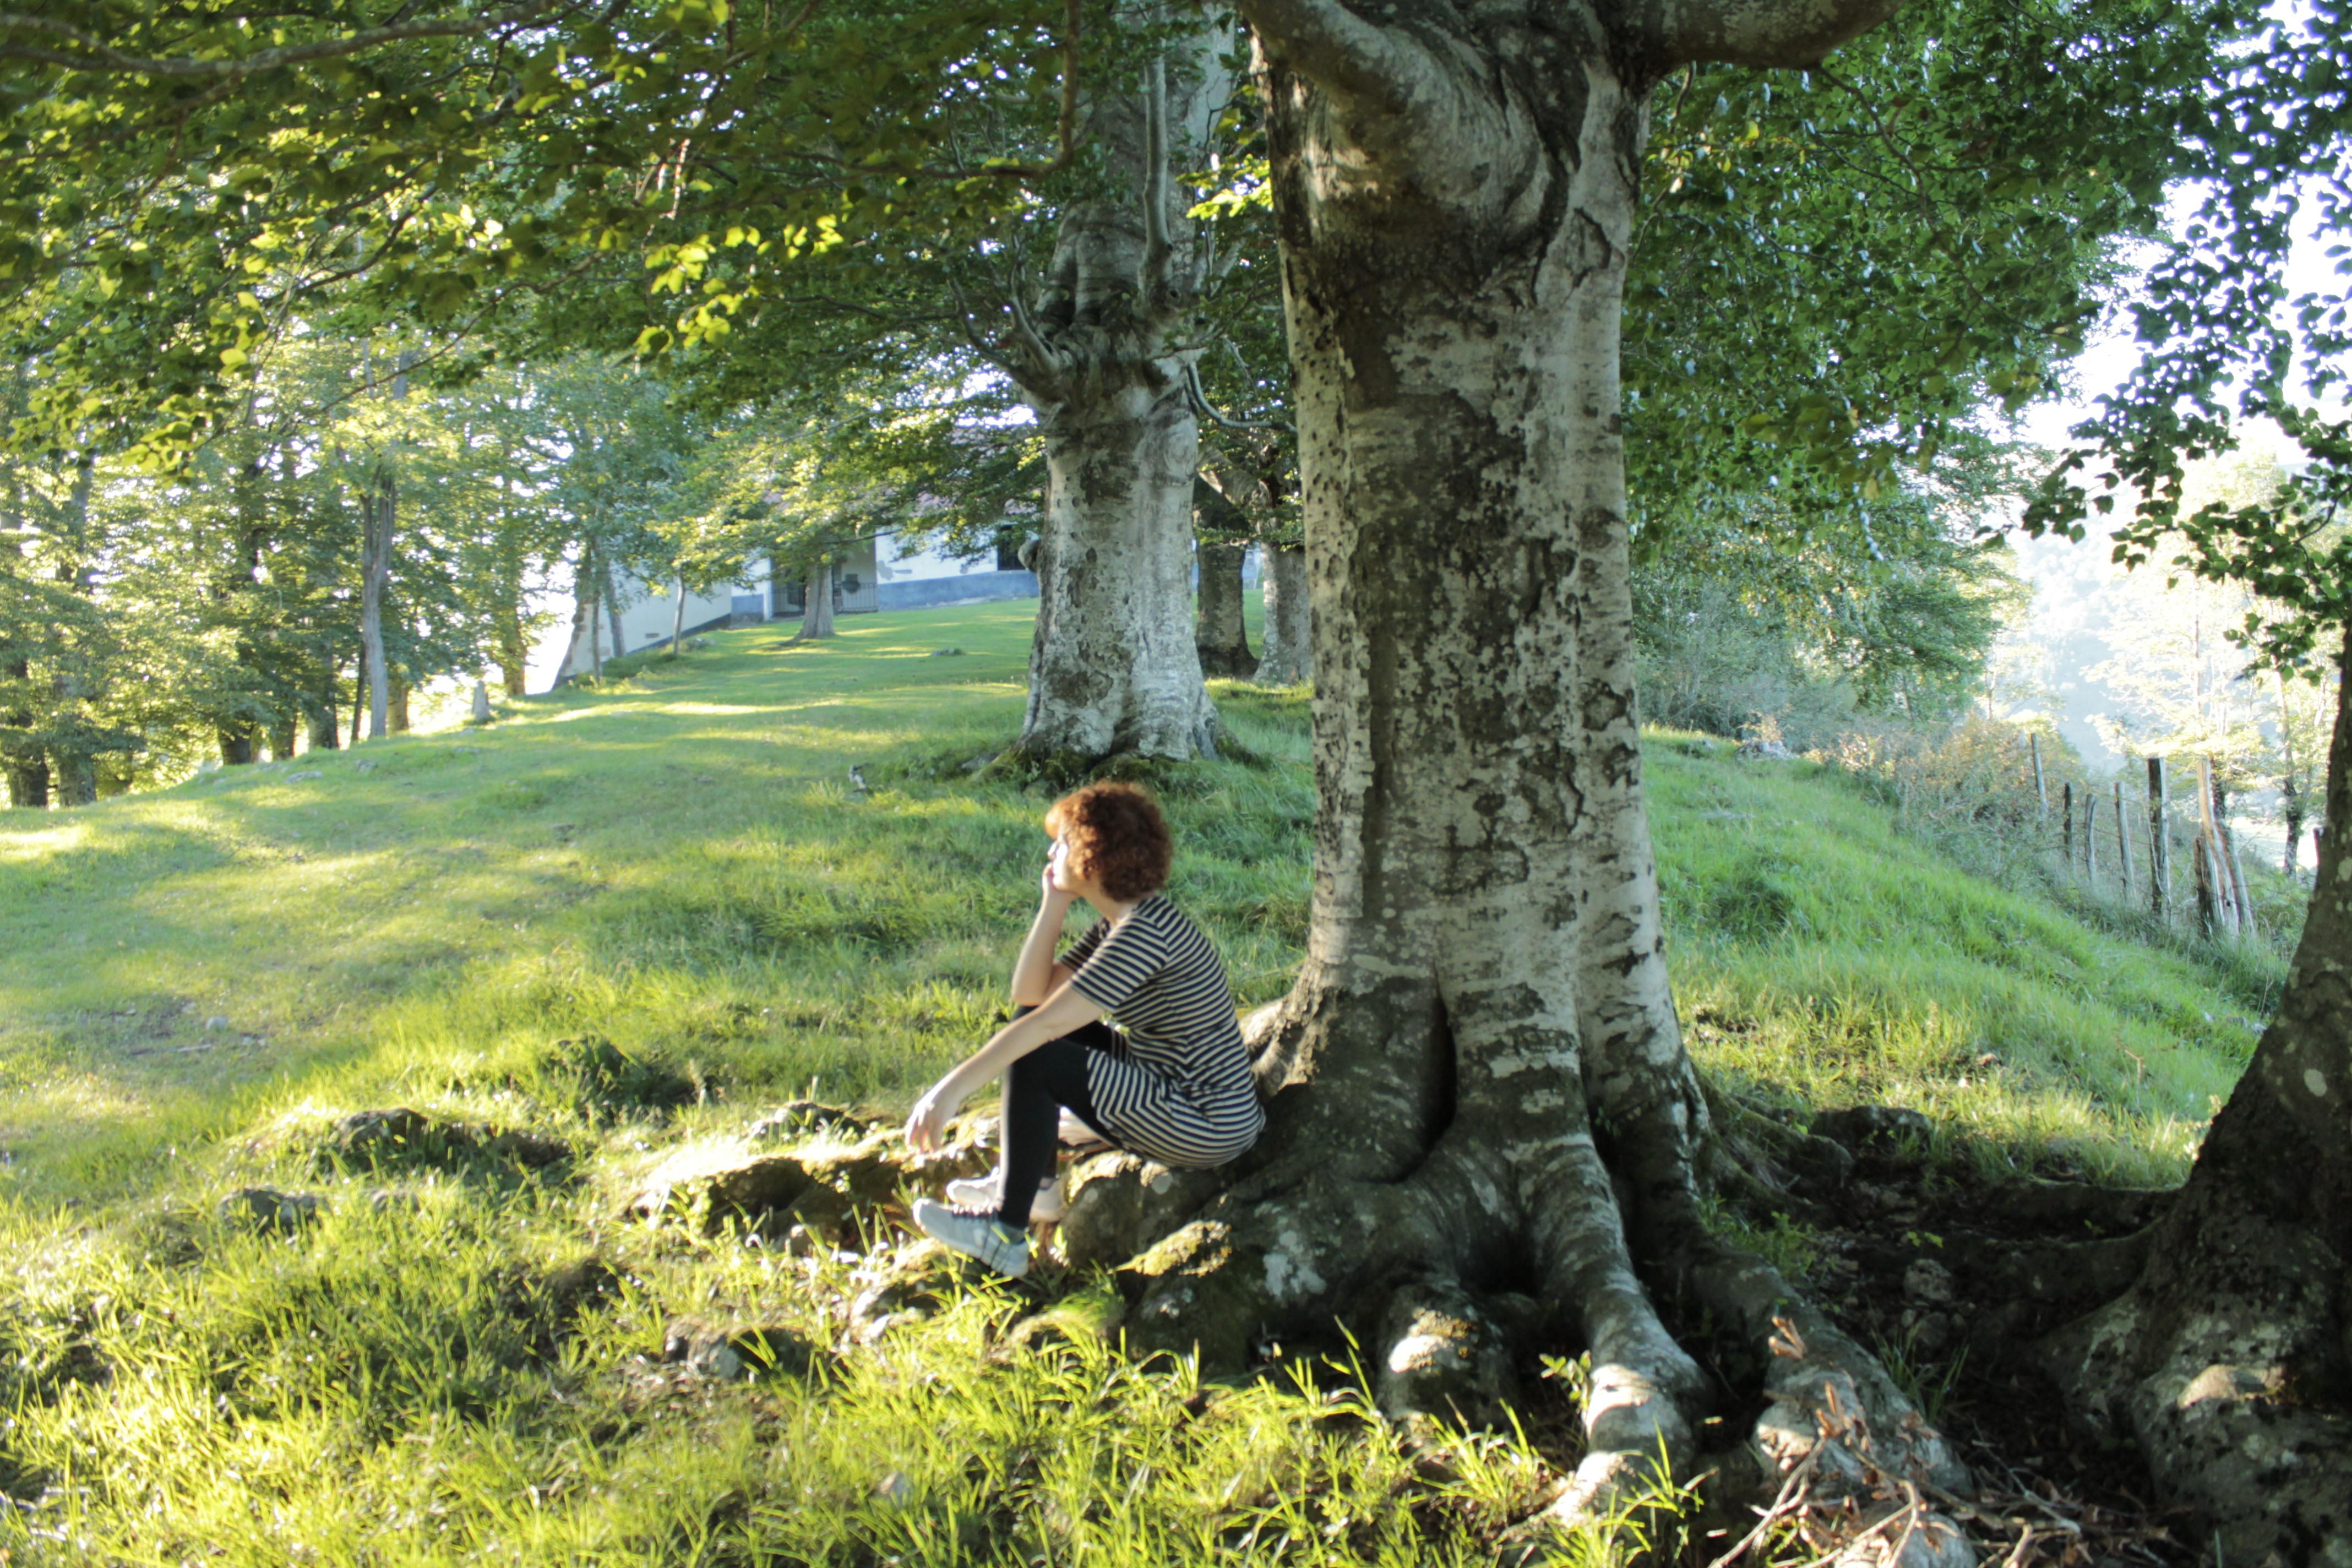 mindfulness · Gemma Sánchez · Cuentos y juegos mindfulness para ...